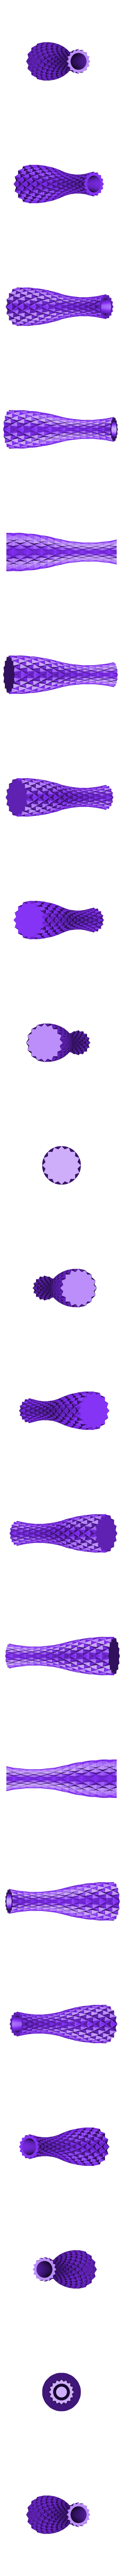 Vaso 32-2.stl Download free STL file Vase 180 • Model to 3D print, OTTO3D